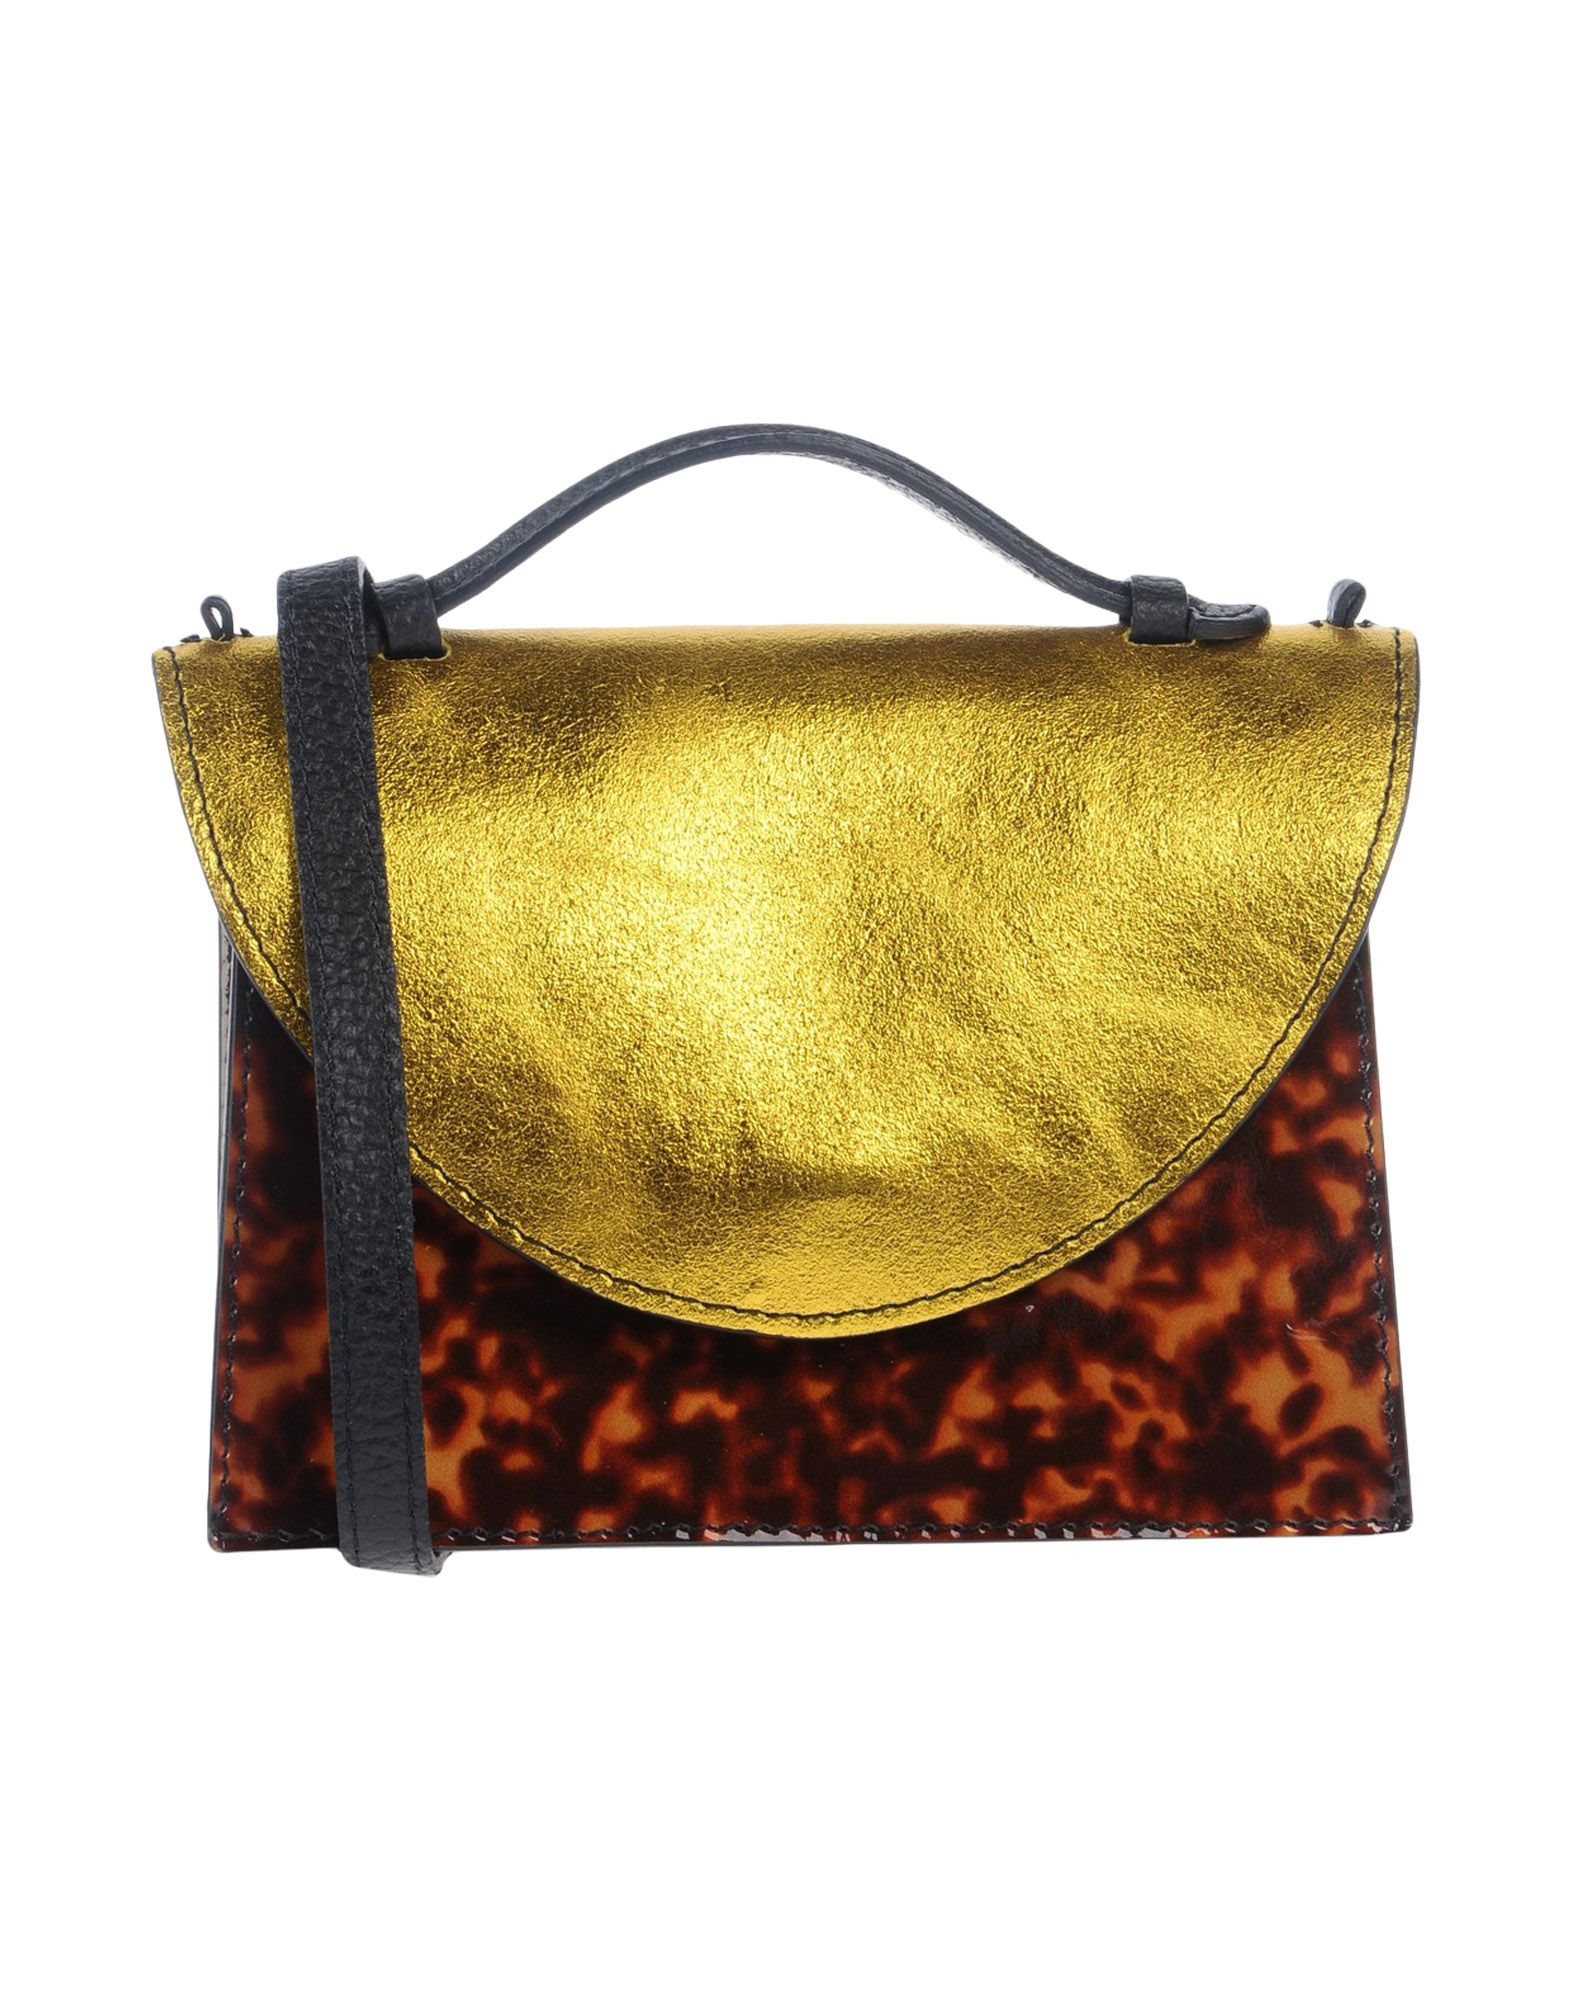 IMEMOI Handbag in Yellow